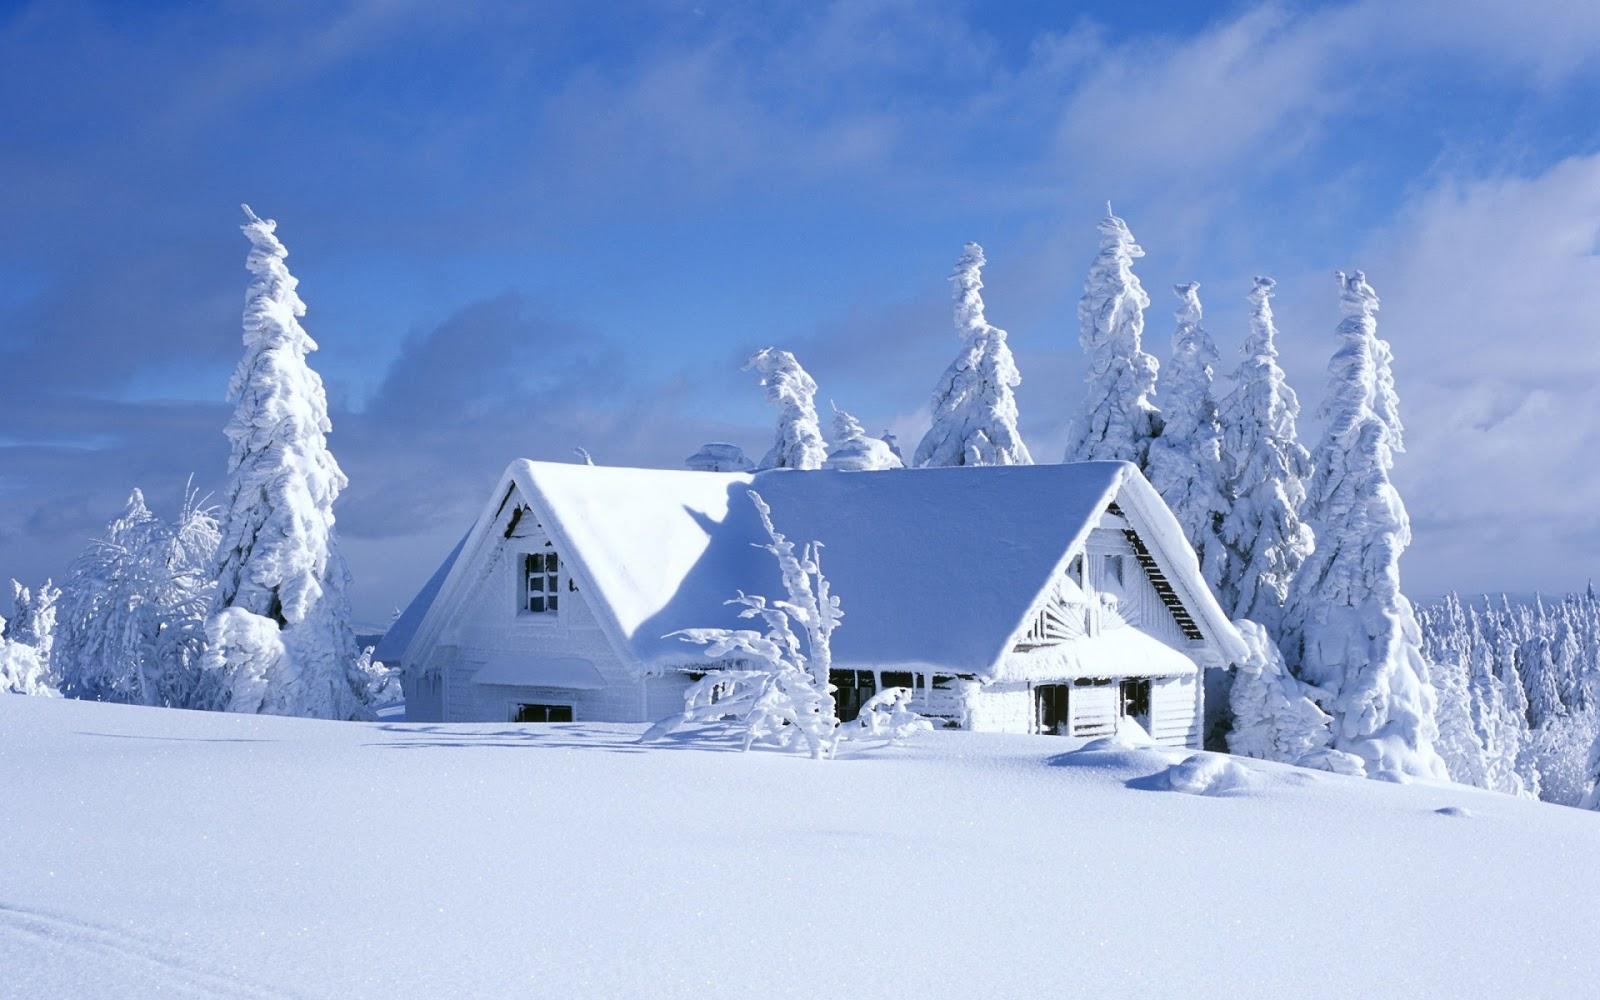 beautiful nature winter wallpaper beautiful nature winter wallpaper 1600x1000